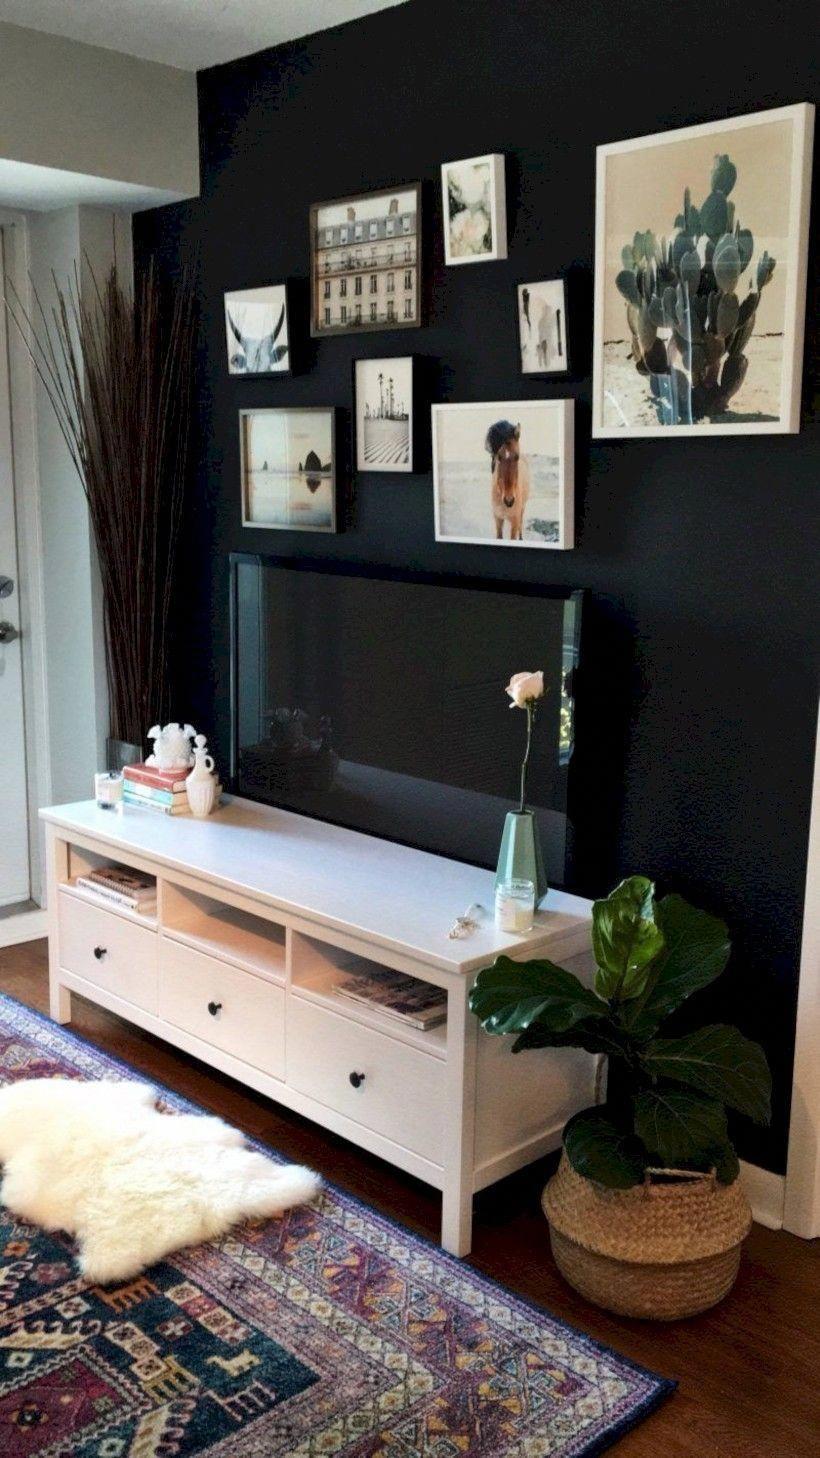 Home Decor Ideas South Africa Apartment Decorating Rental Small Apartment Decorating Apartment Decor